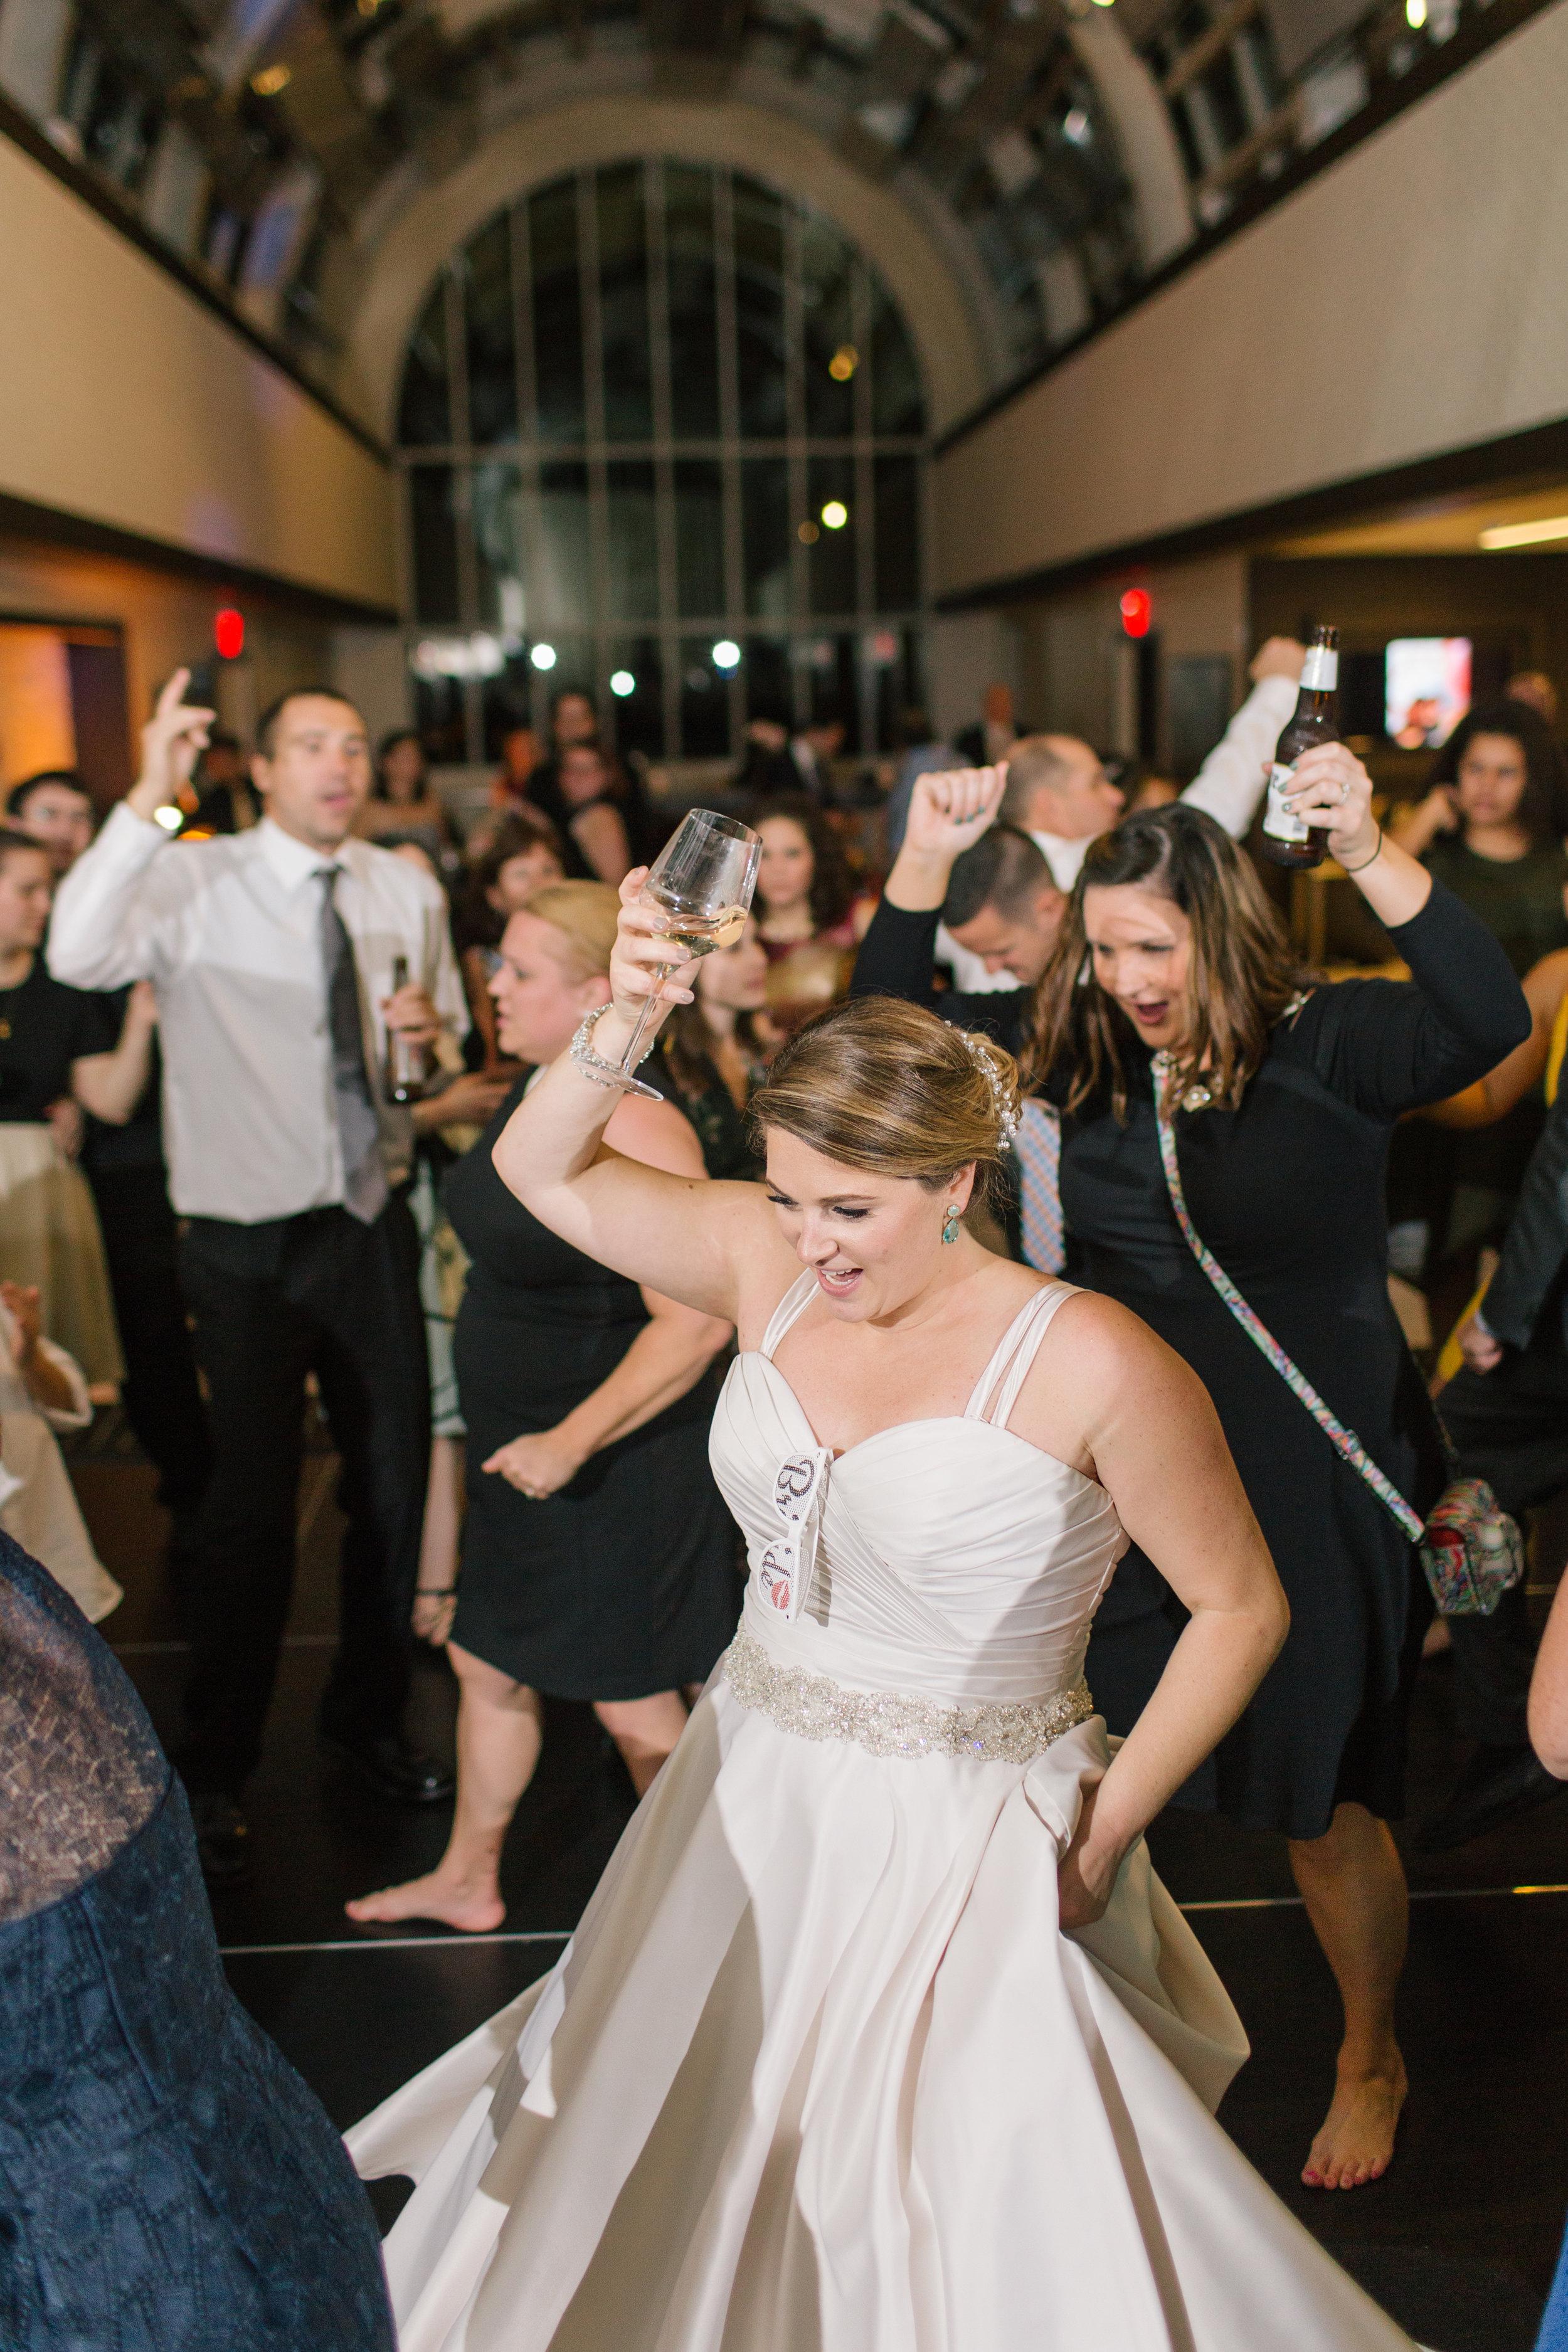 Wedding DJ services in Fredrick, MD